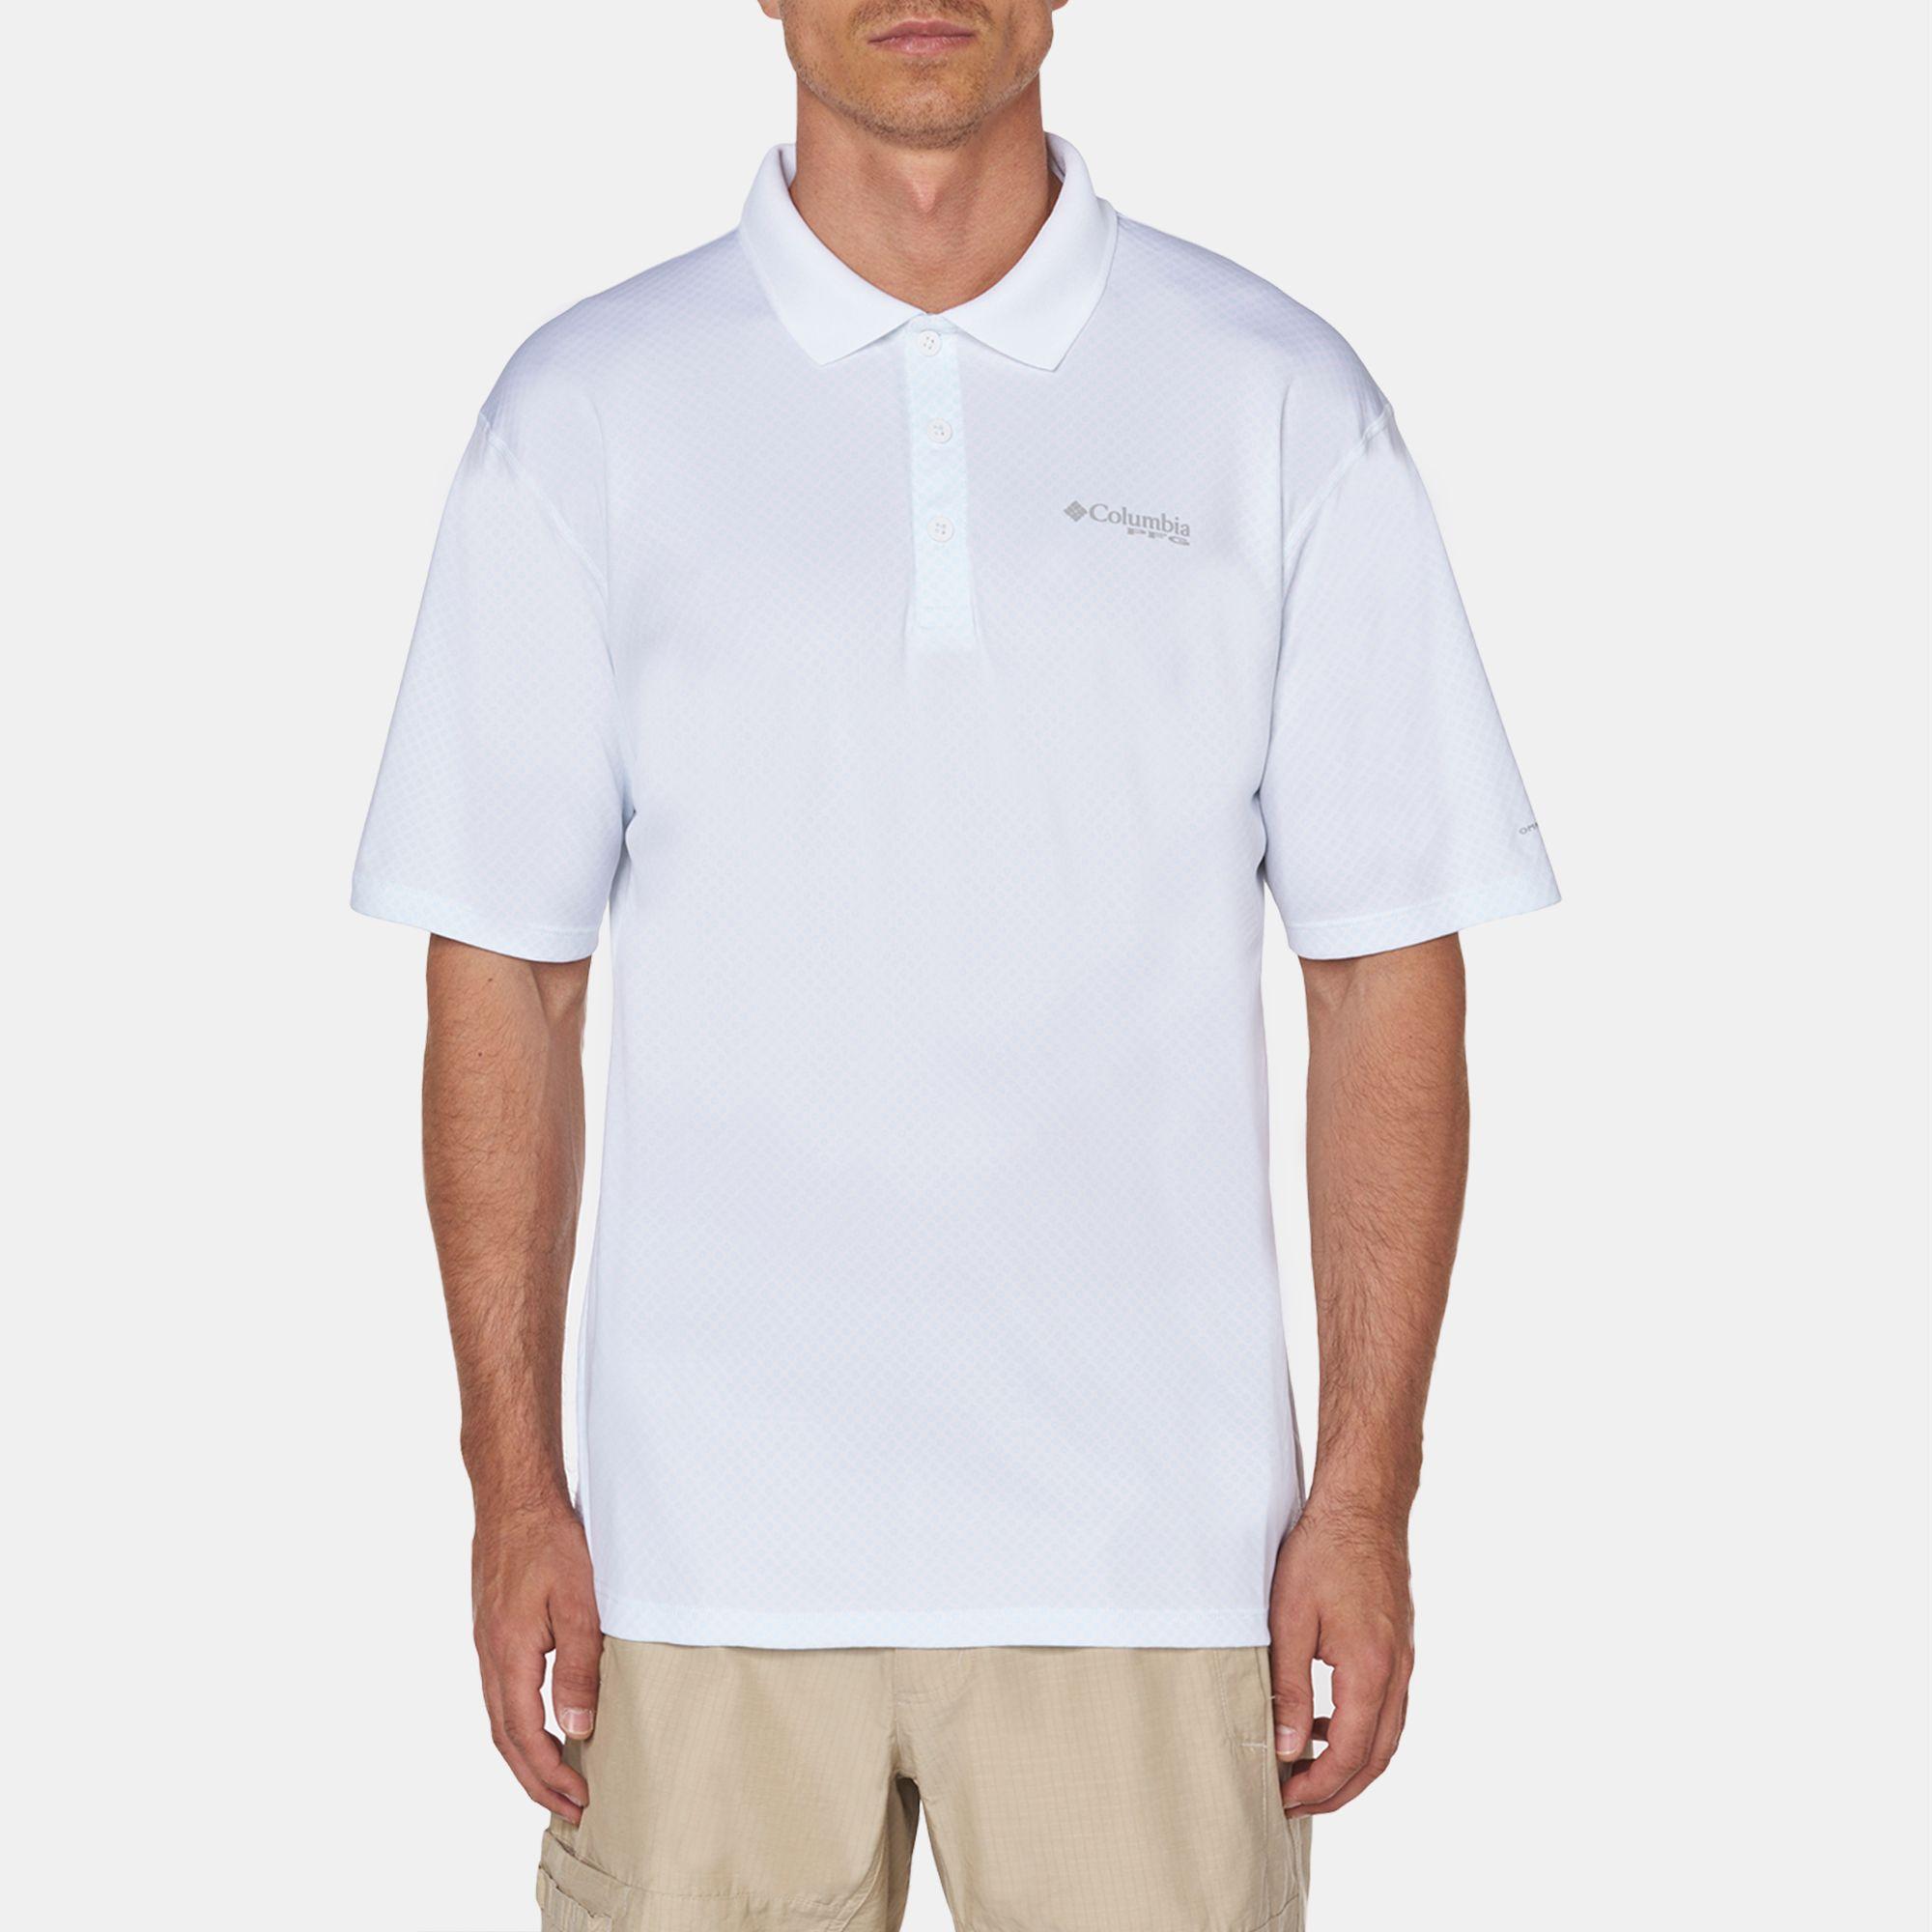 2244d67b1b7 Shop Columbia PFG ZERO Rules™ Polo Shirt for Mens by Columbia | SSS